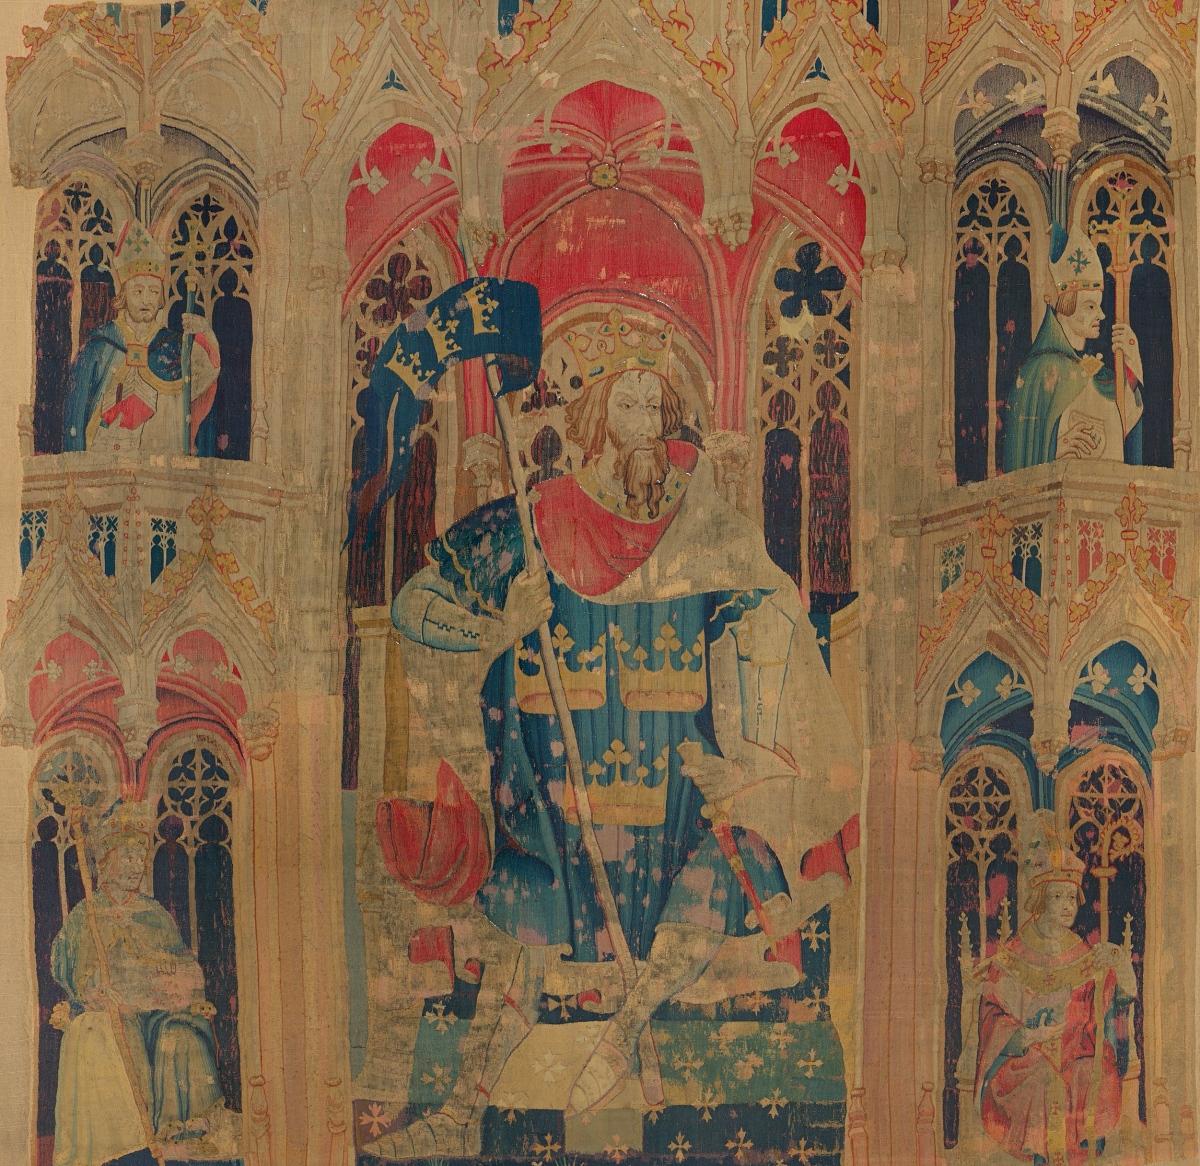 15th century tapestry depicting King Arthur